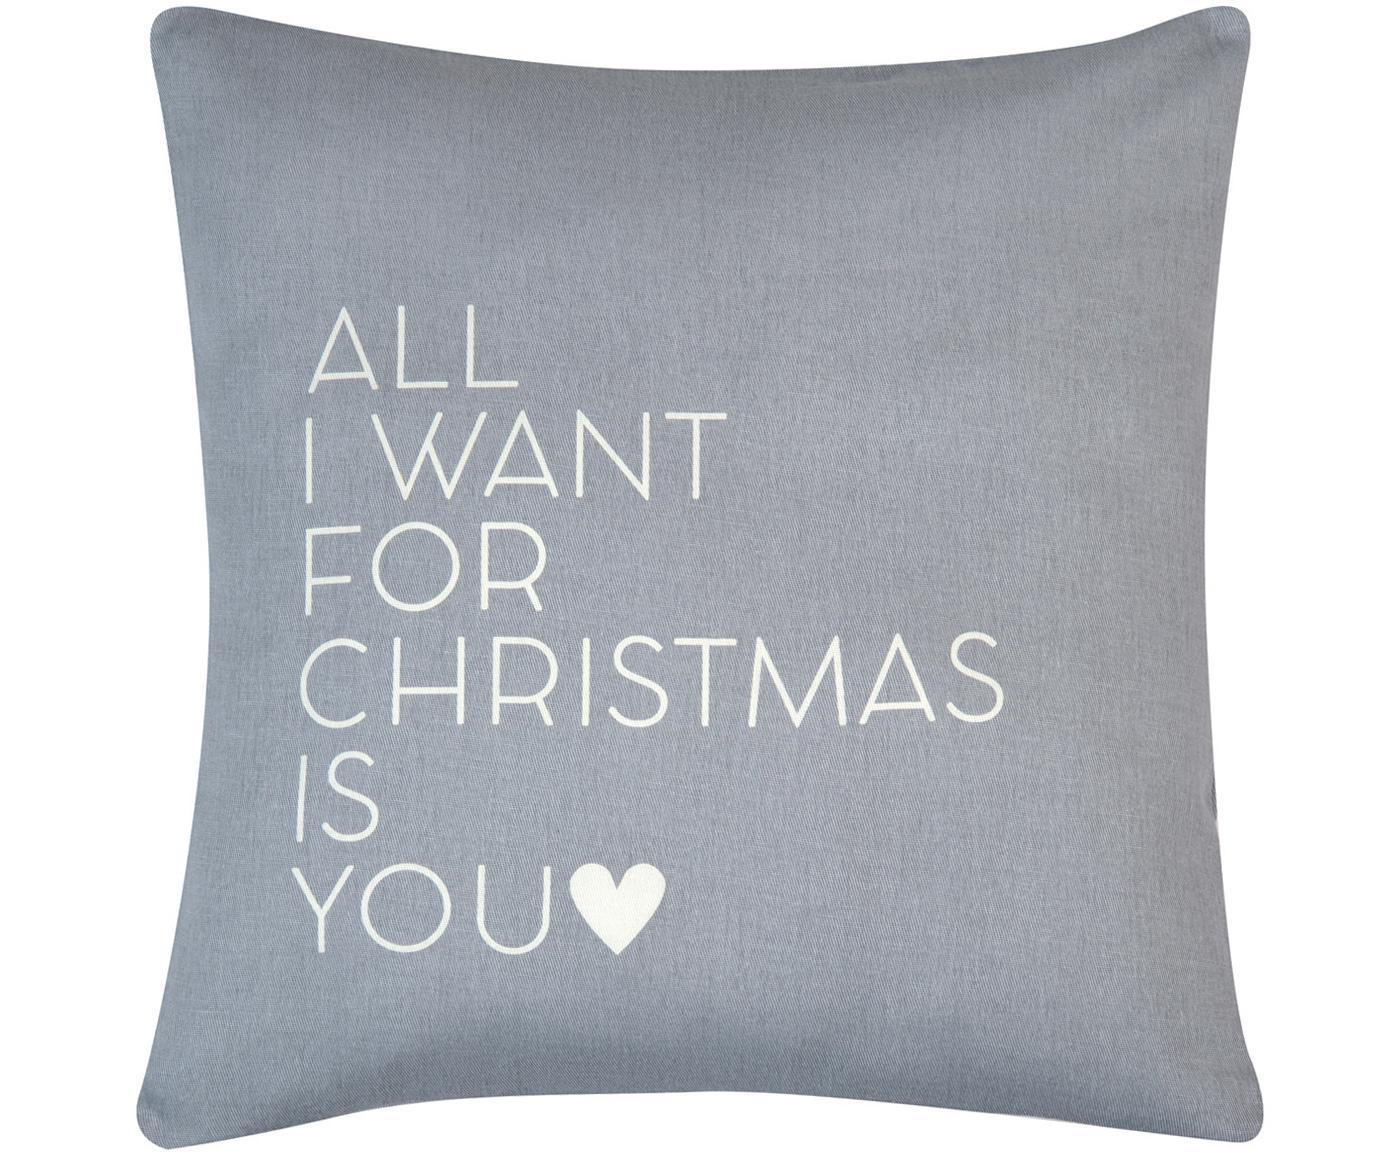 Kussenhoes All I Want, 100% katoen, panamabinding, Grijs, ecru, 40 x 40 cm